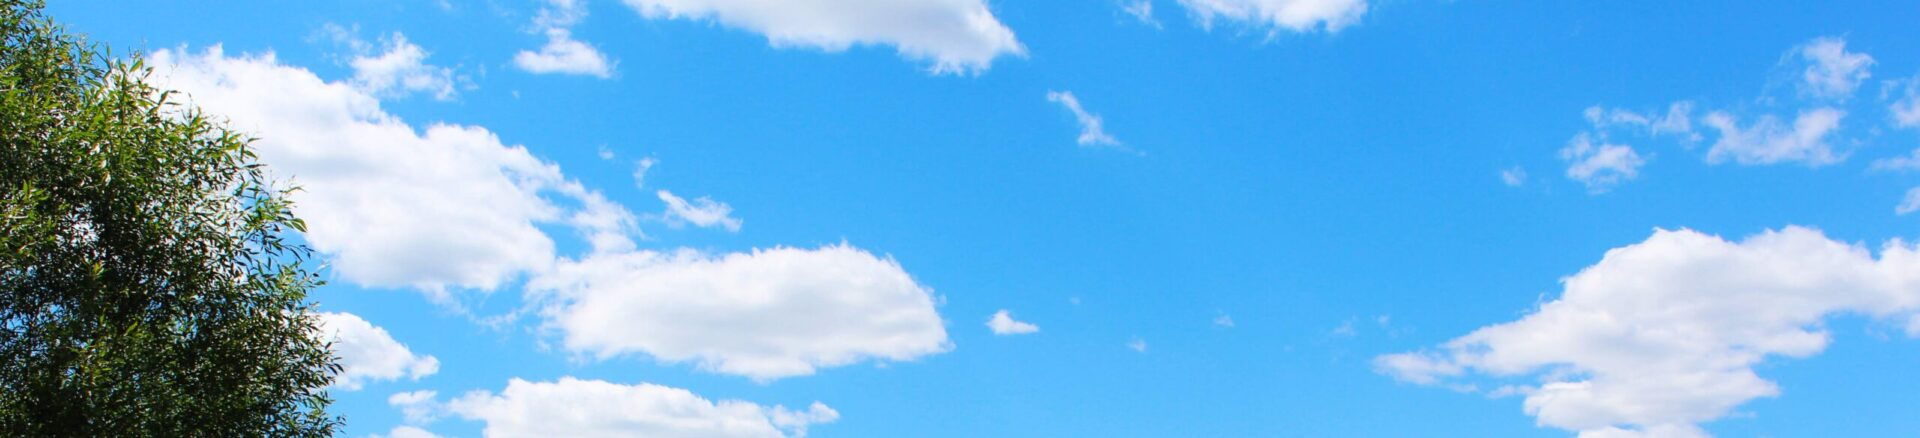 Всесвітній День синички в Народицькому ДНЗ «Сонечко»